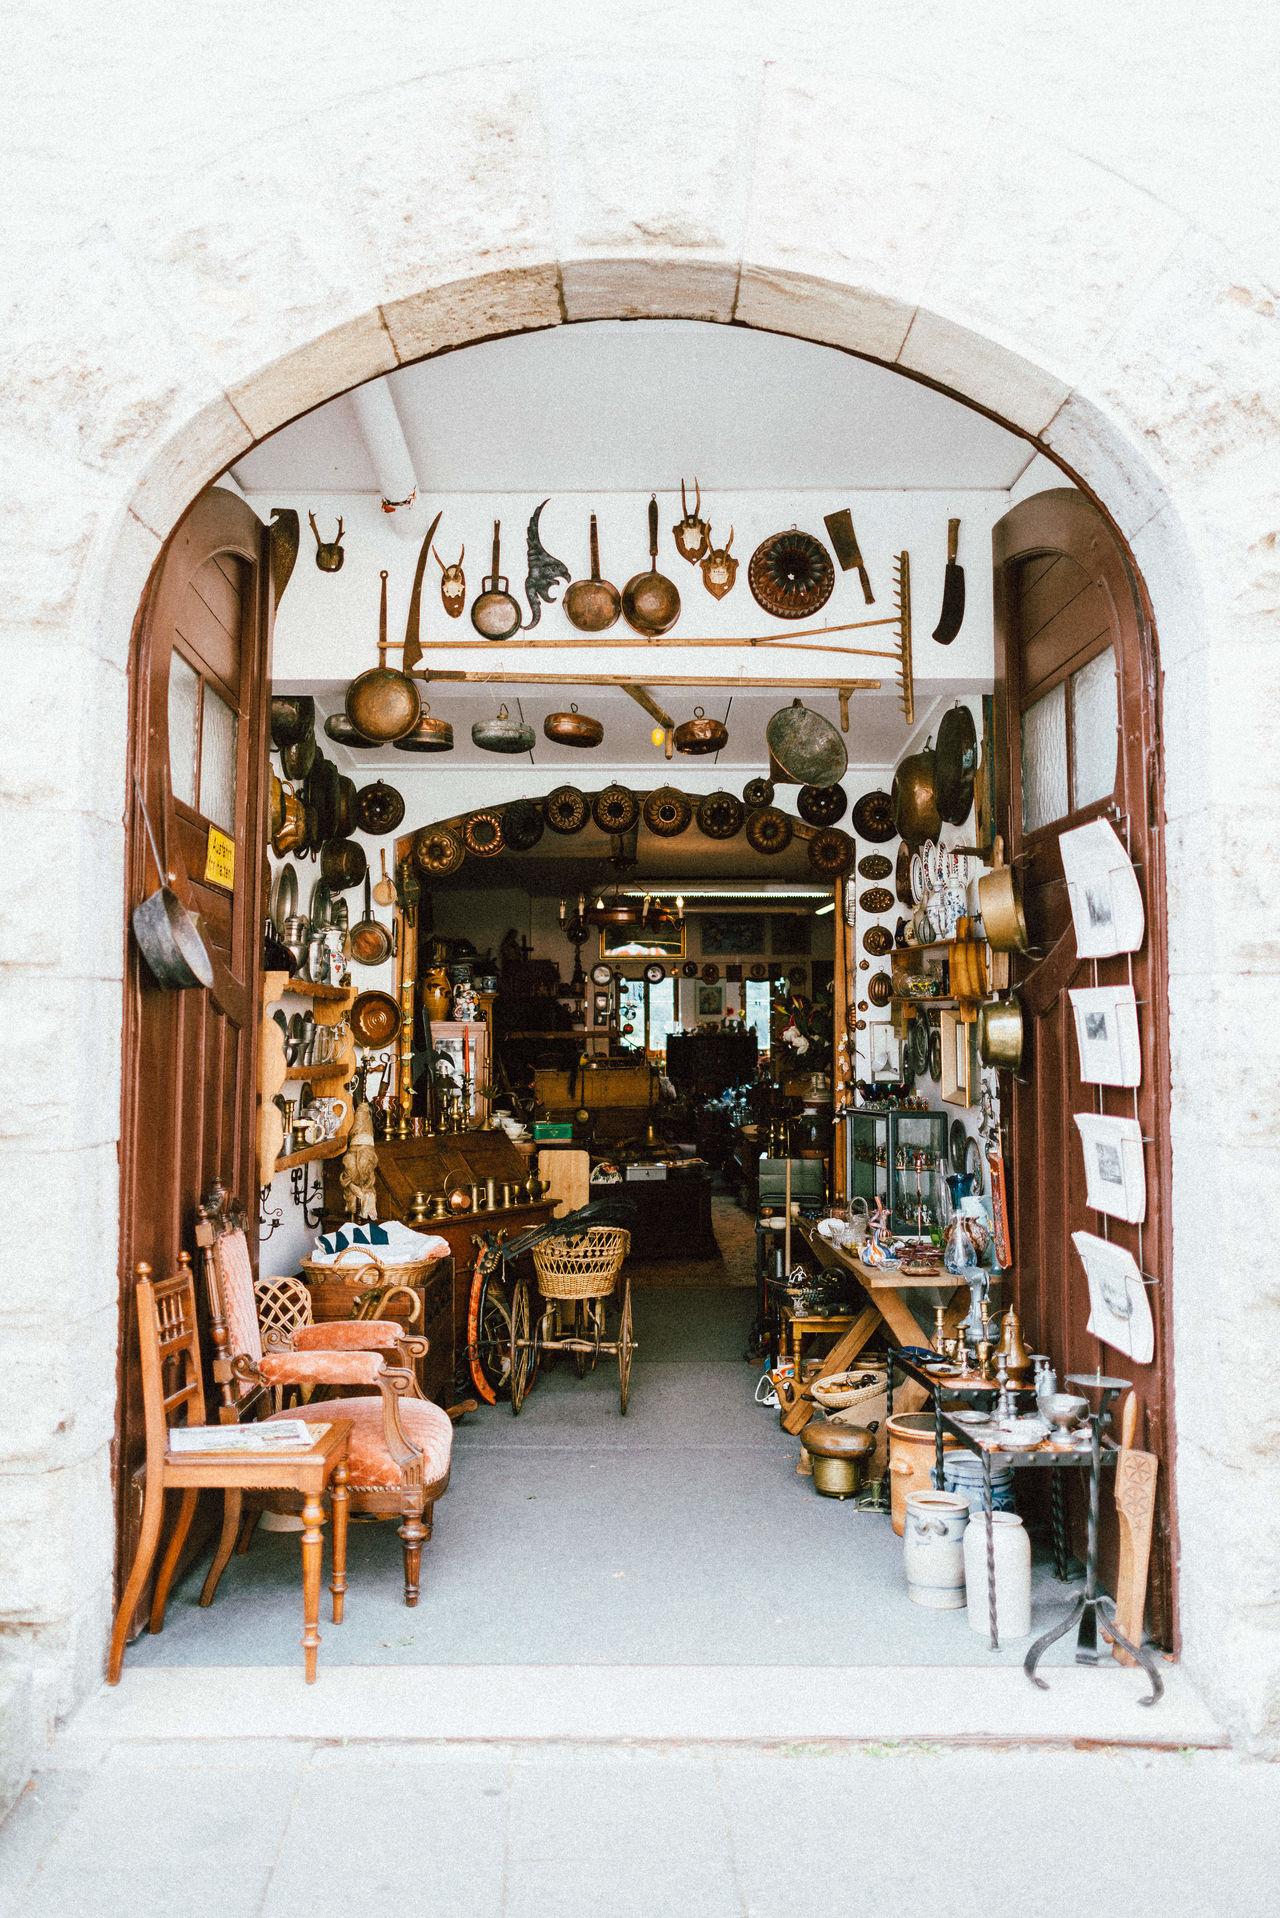 Tiny Vintage Shop in Rothenburg ob der Tauber. Architecture Day Entrance Heritage History Indoors  No People Shop Travel Travel Destinations Vintage